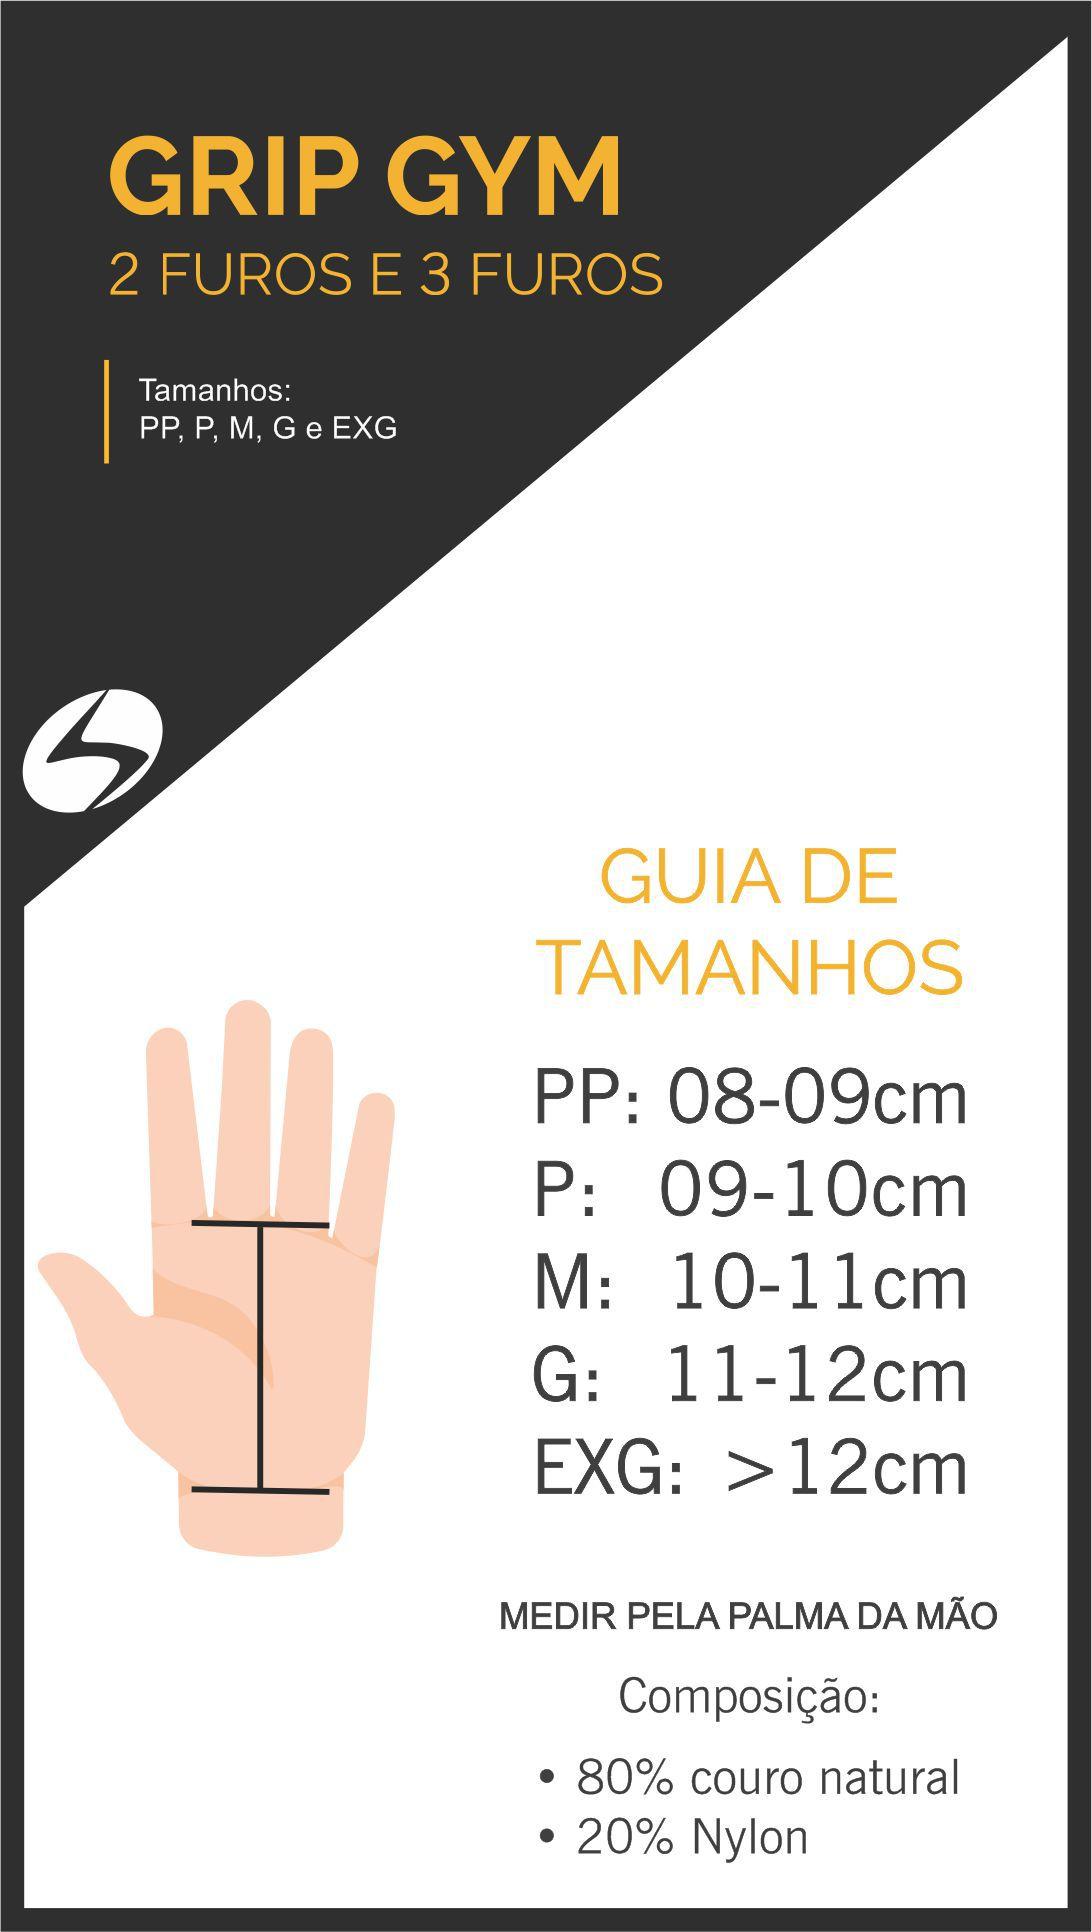 Grip Gym Export 2.0 - Hand Grip - Crossfit - Preto